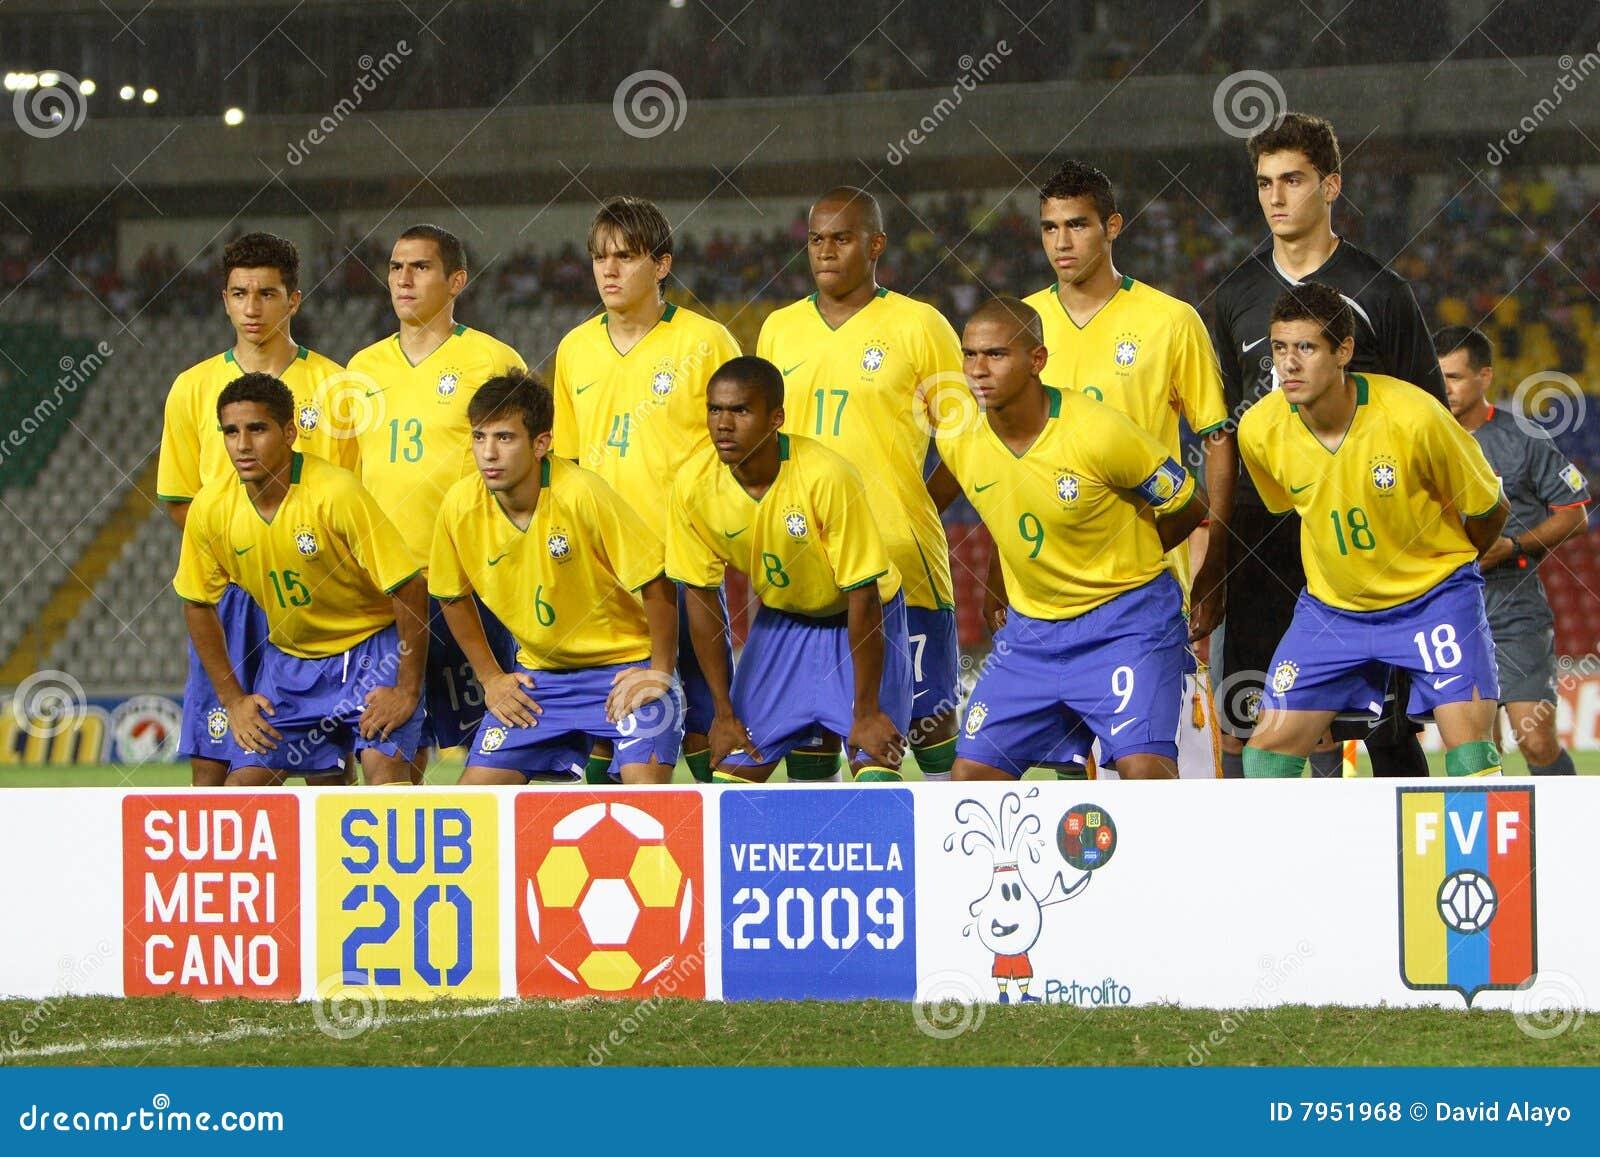 Brasil Soccer Team Locker Room